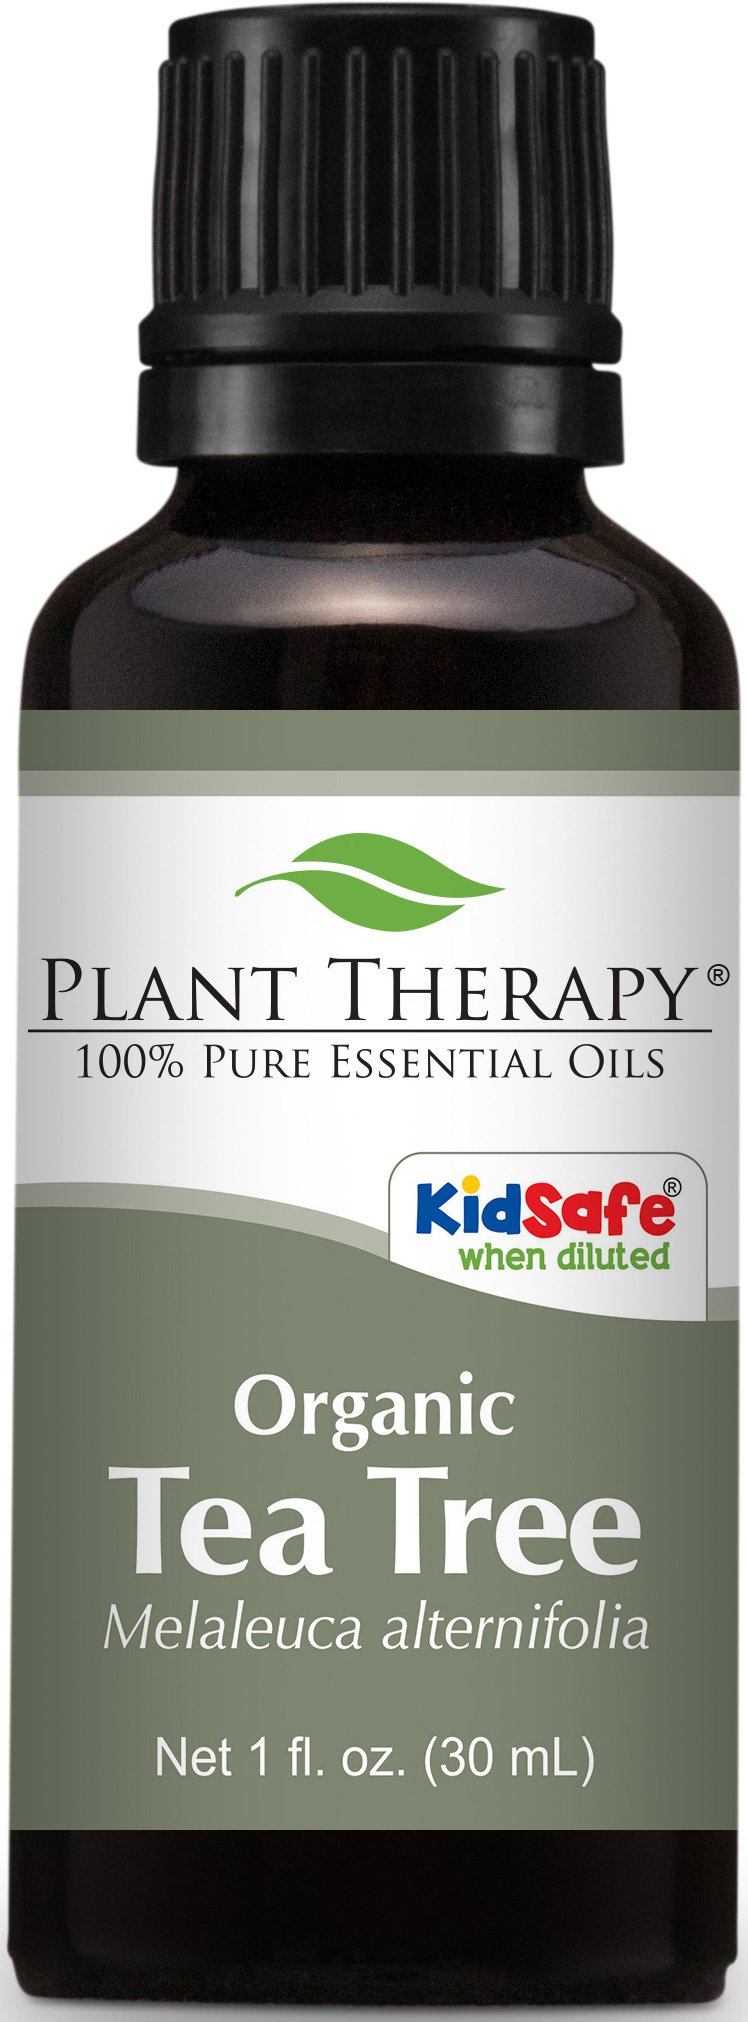 Plant Therapy USDA Certified Organic Tea Tree (Melaleuca) Essential Oil. 100% Pure, Undiluted, Therapeutic Grade. 30 ml (1 oz).